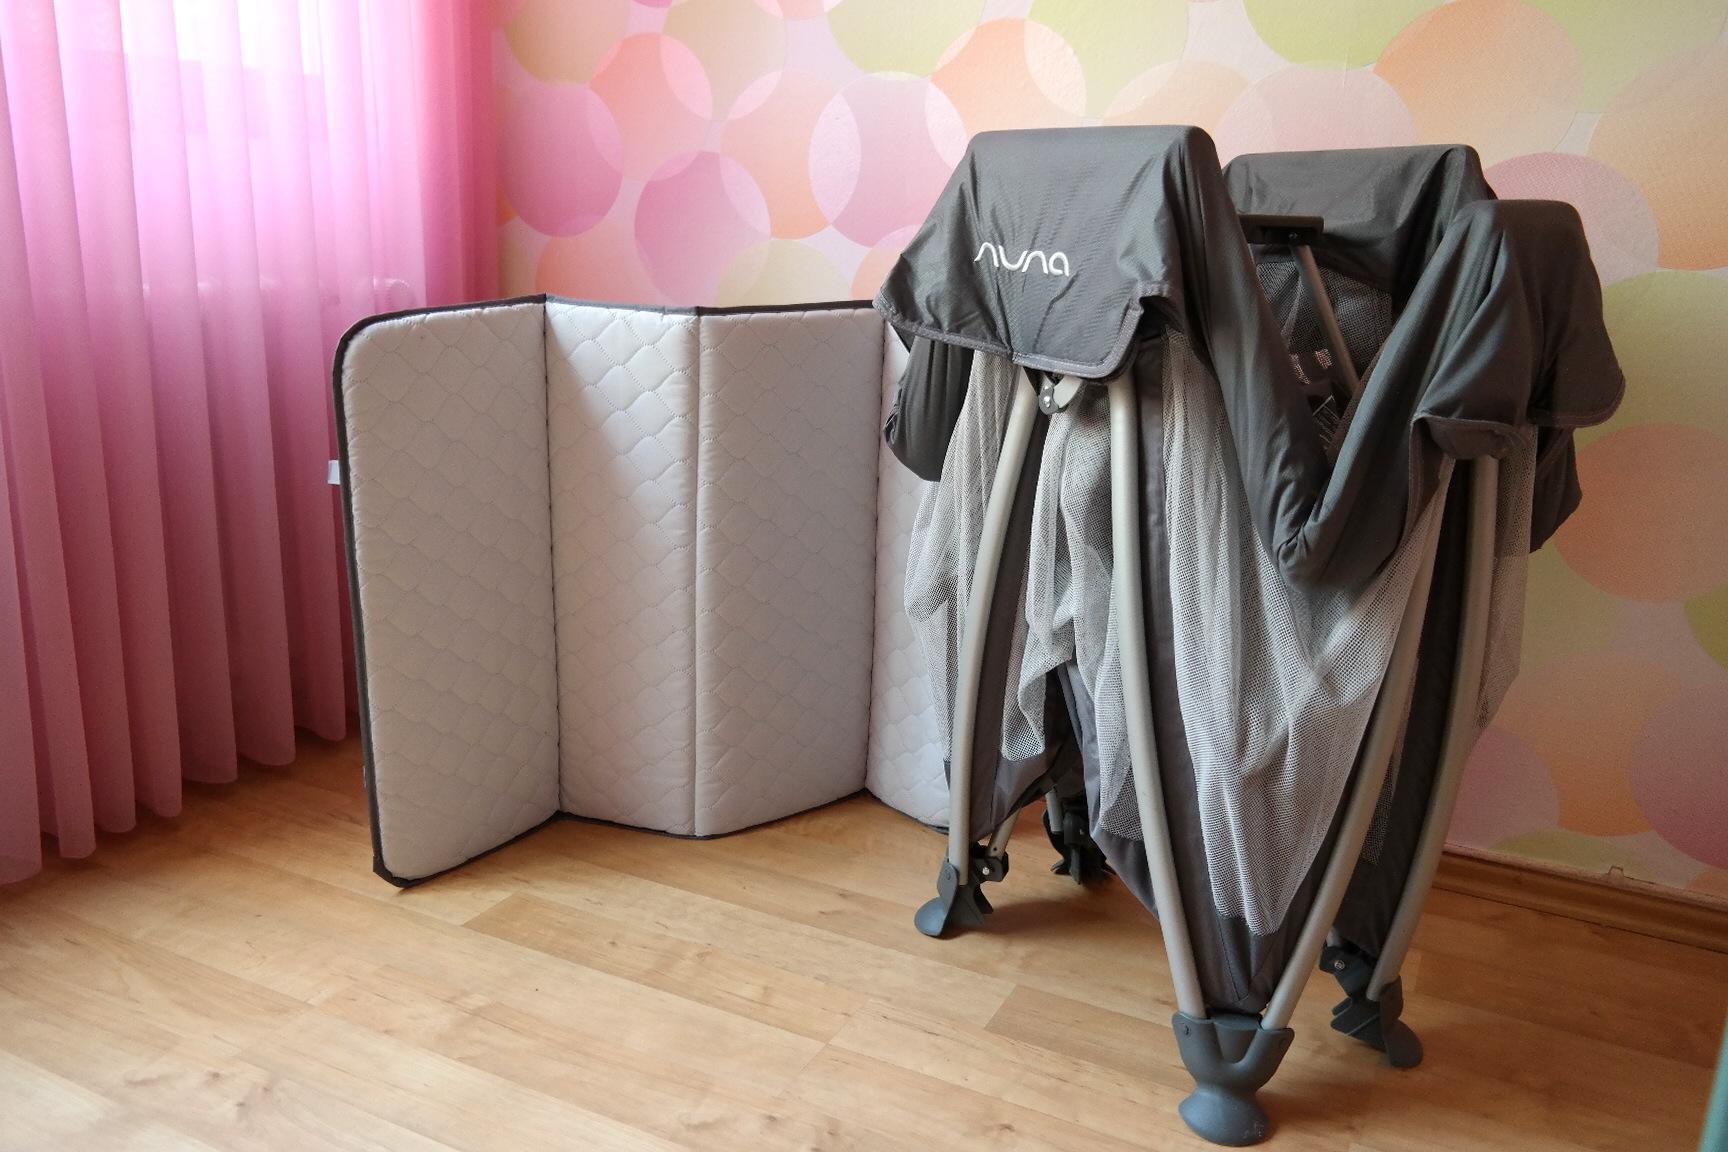 zur ck in die zukunft missbonn e bonn e. Black Bedroom Furniture Sets. Home Design Ideas